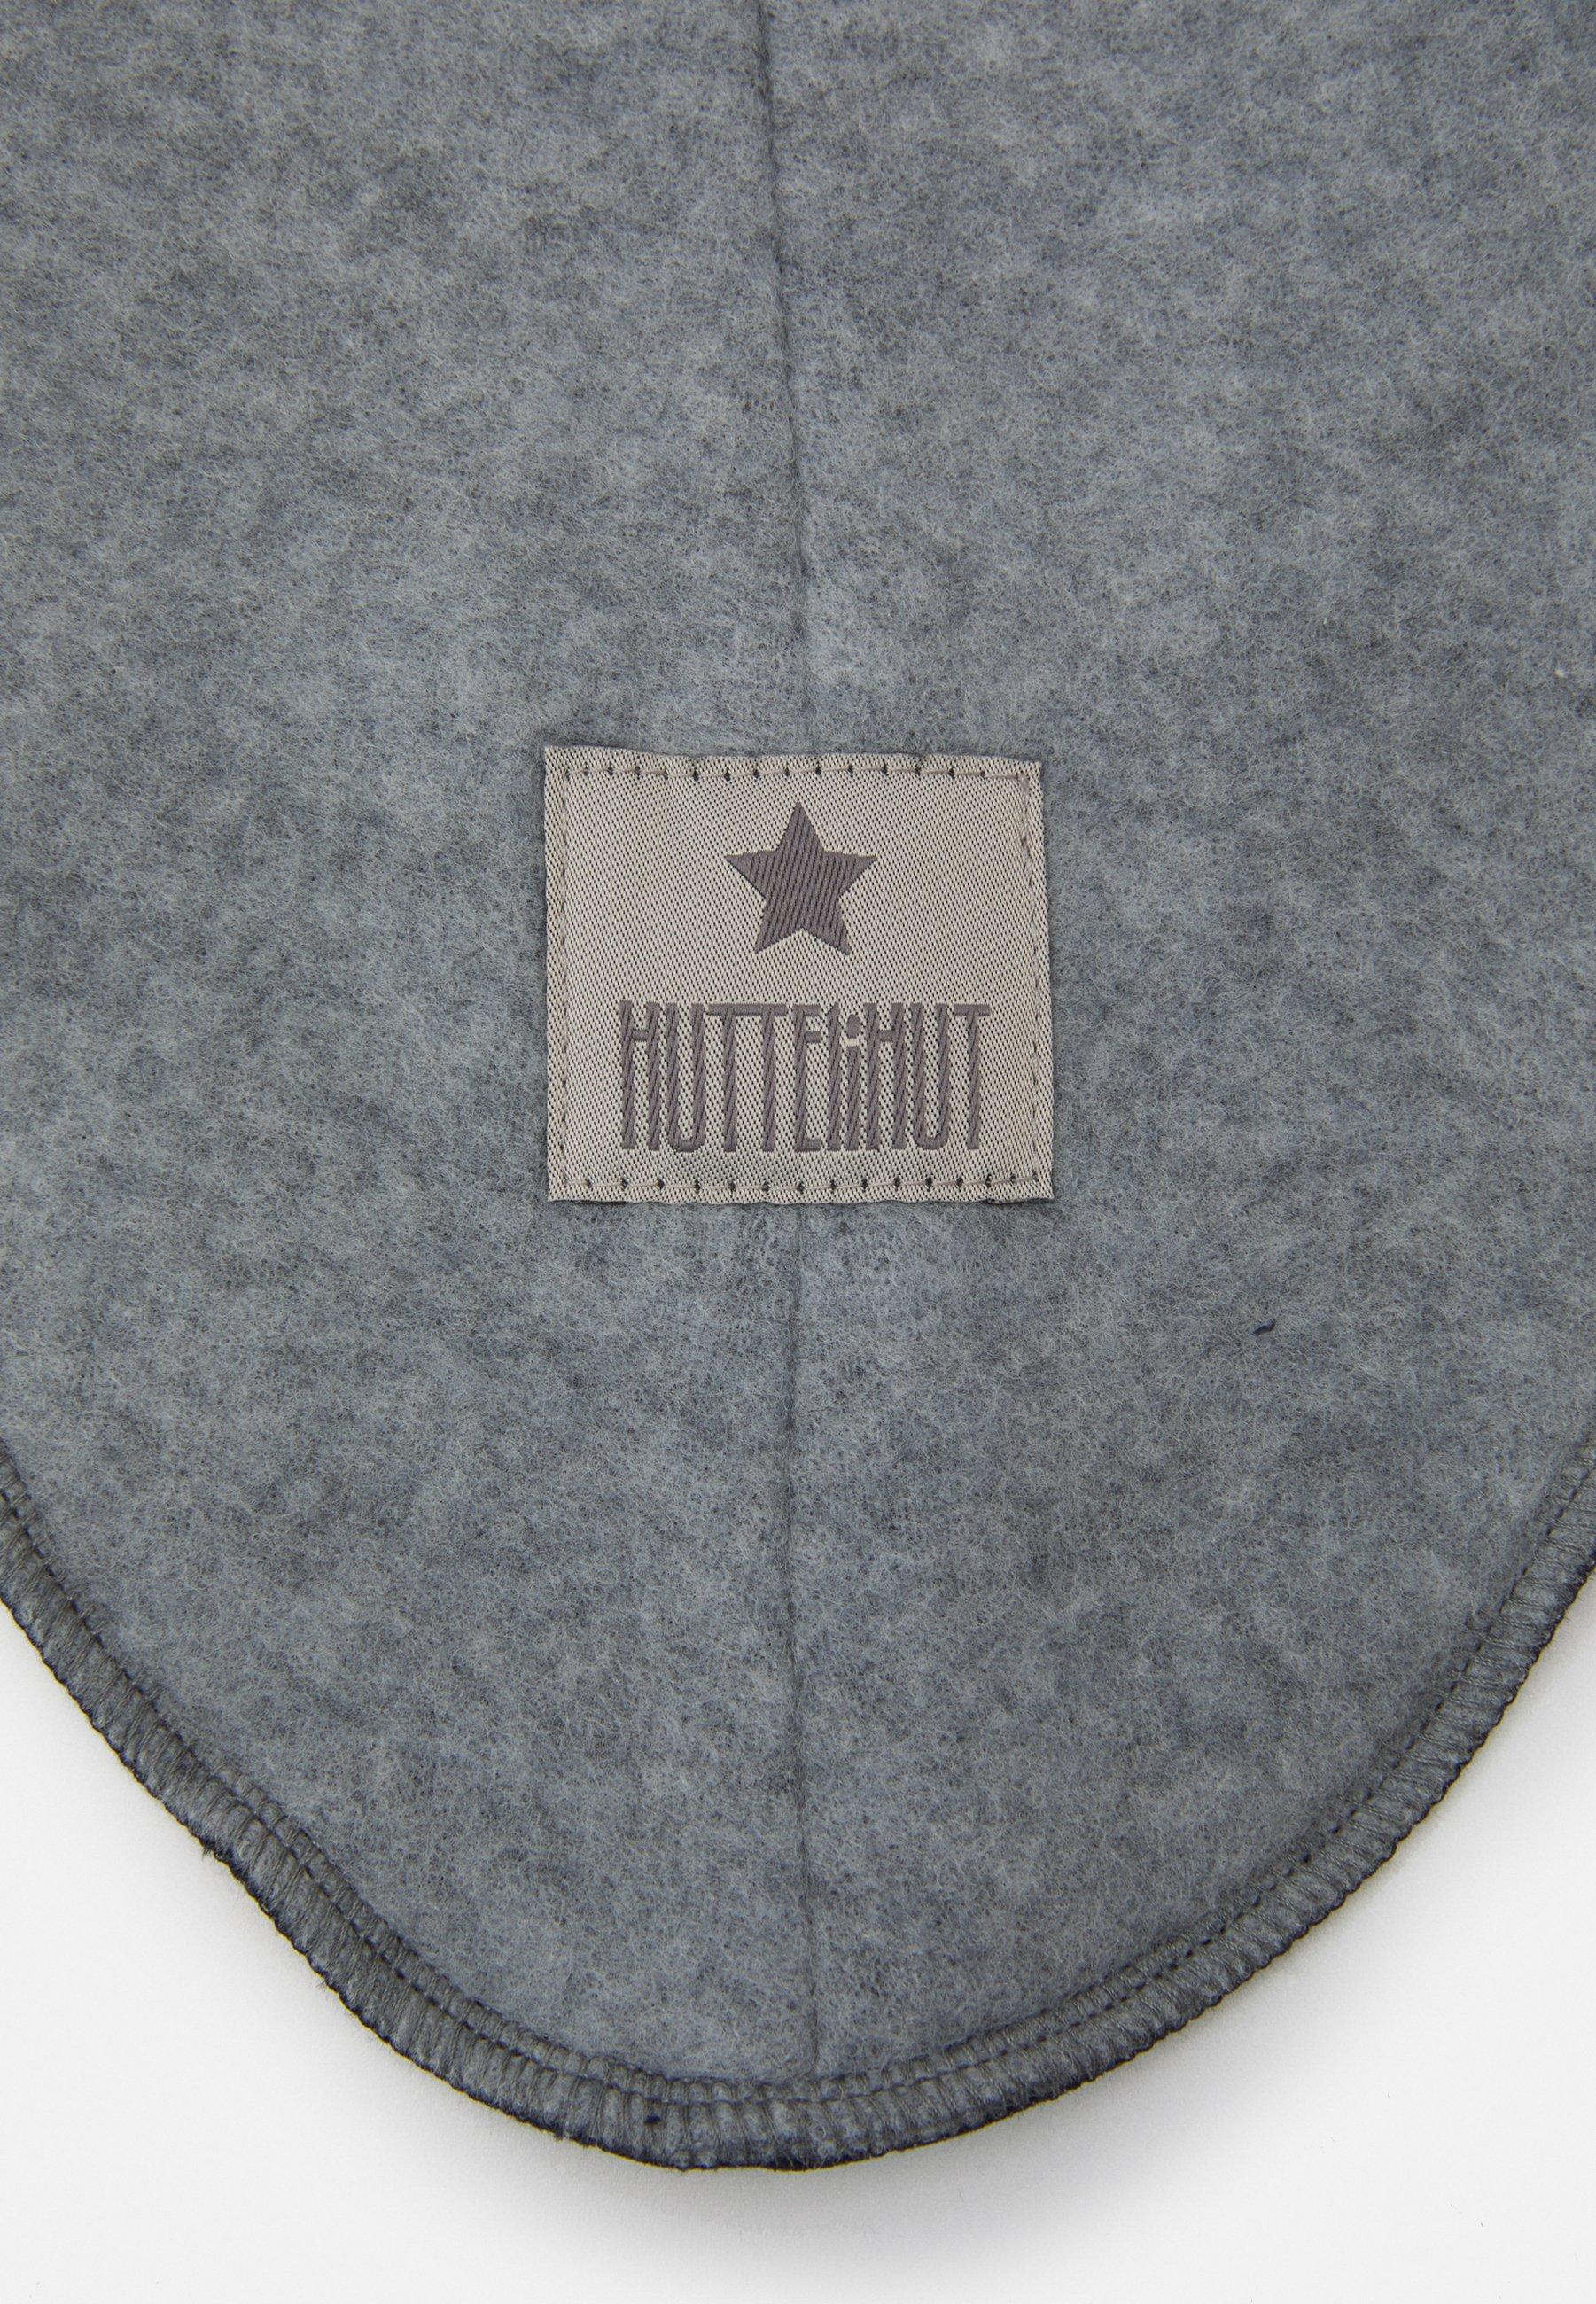 Huttelihut STARS - Lue - light grey/navy/grå gWAUF5IBXIyk1vJ